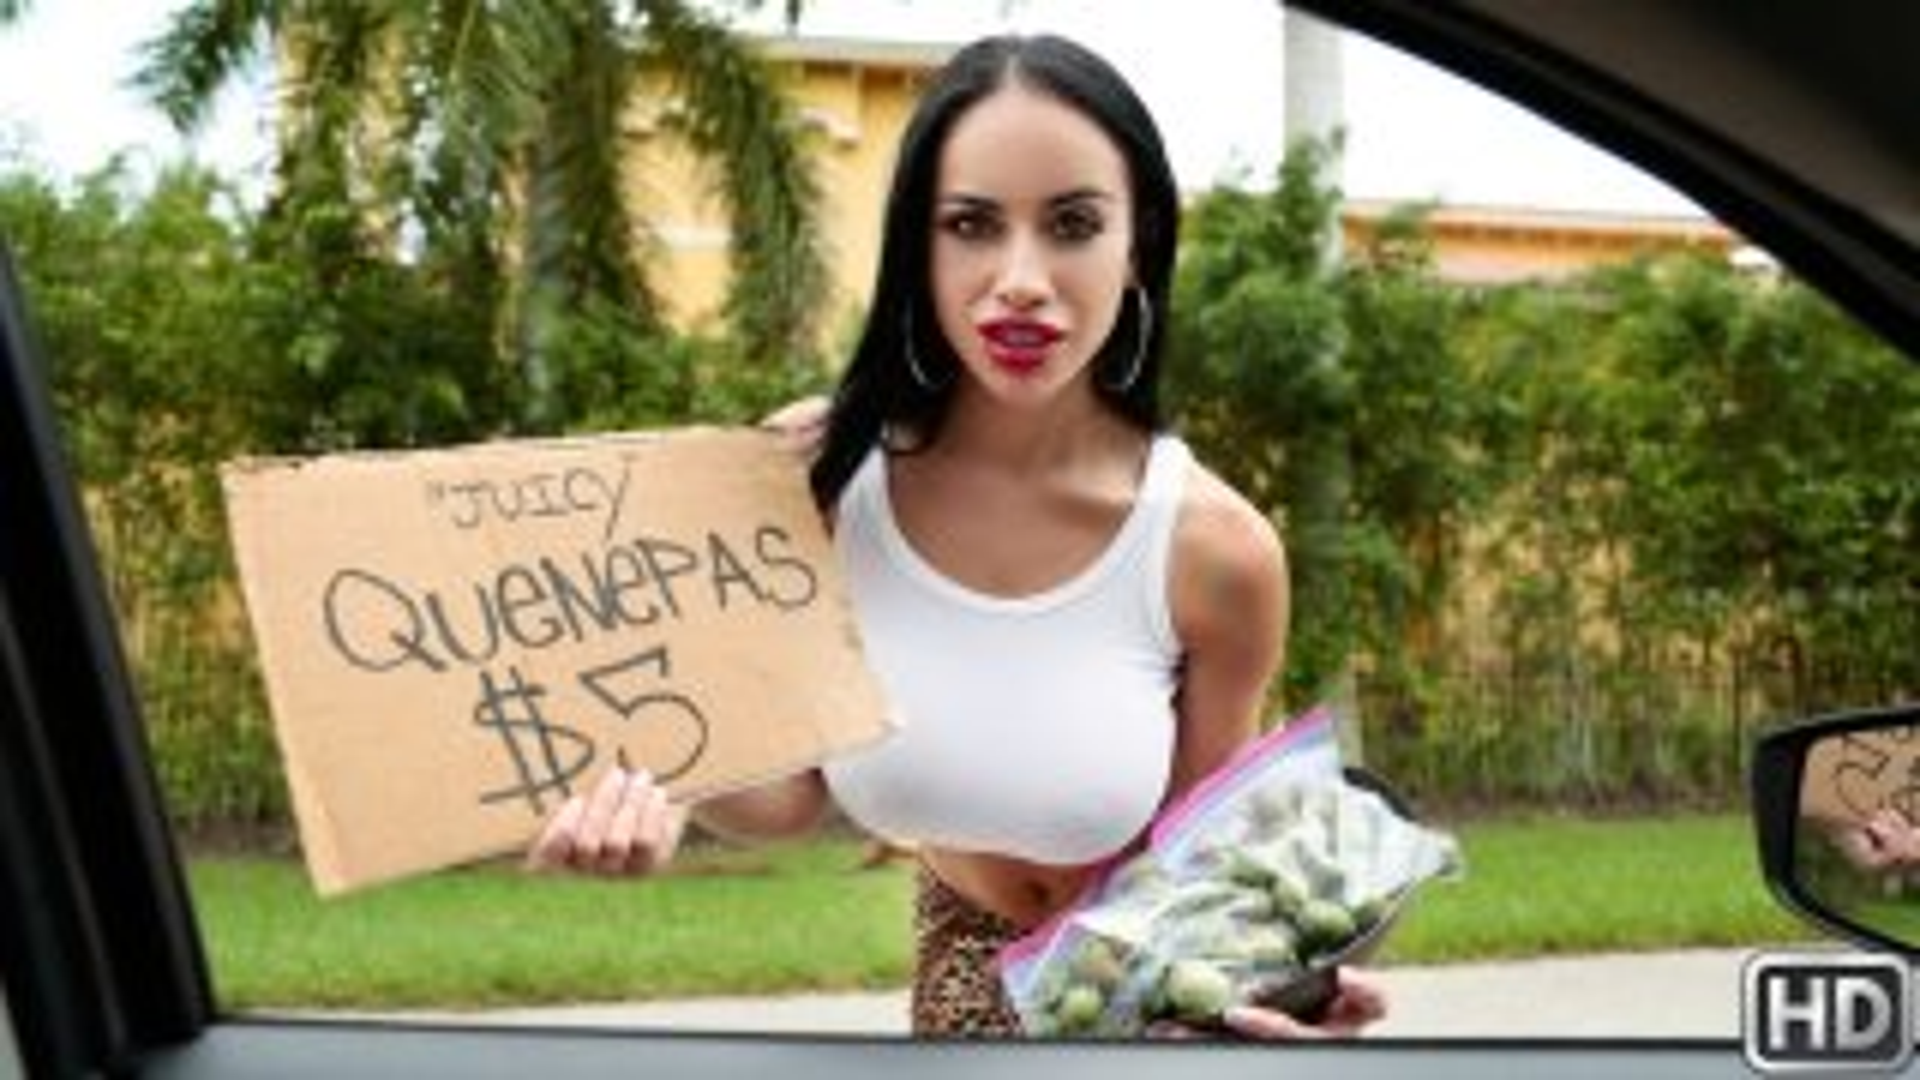 Selling Nuts - 8th Street Latinas